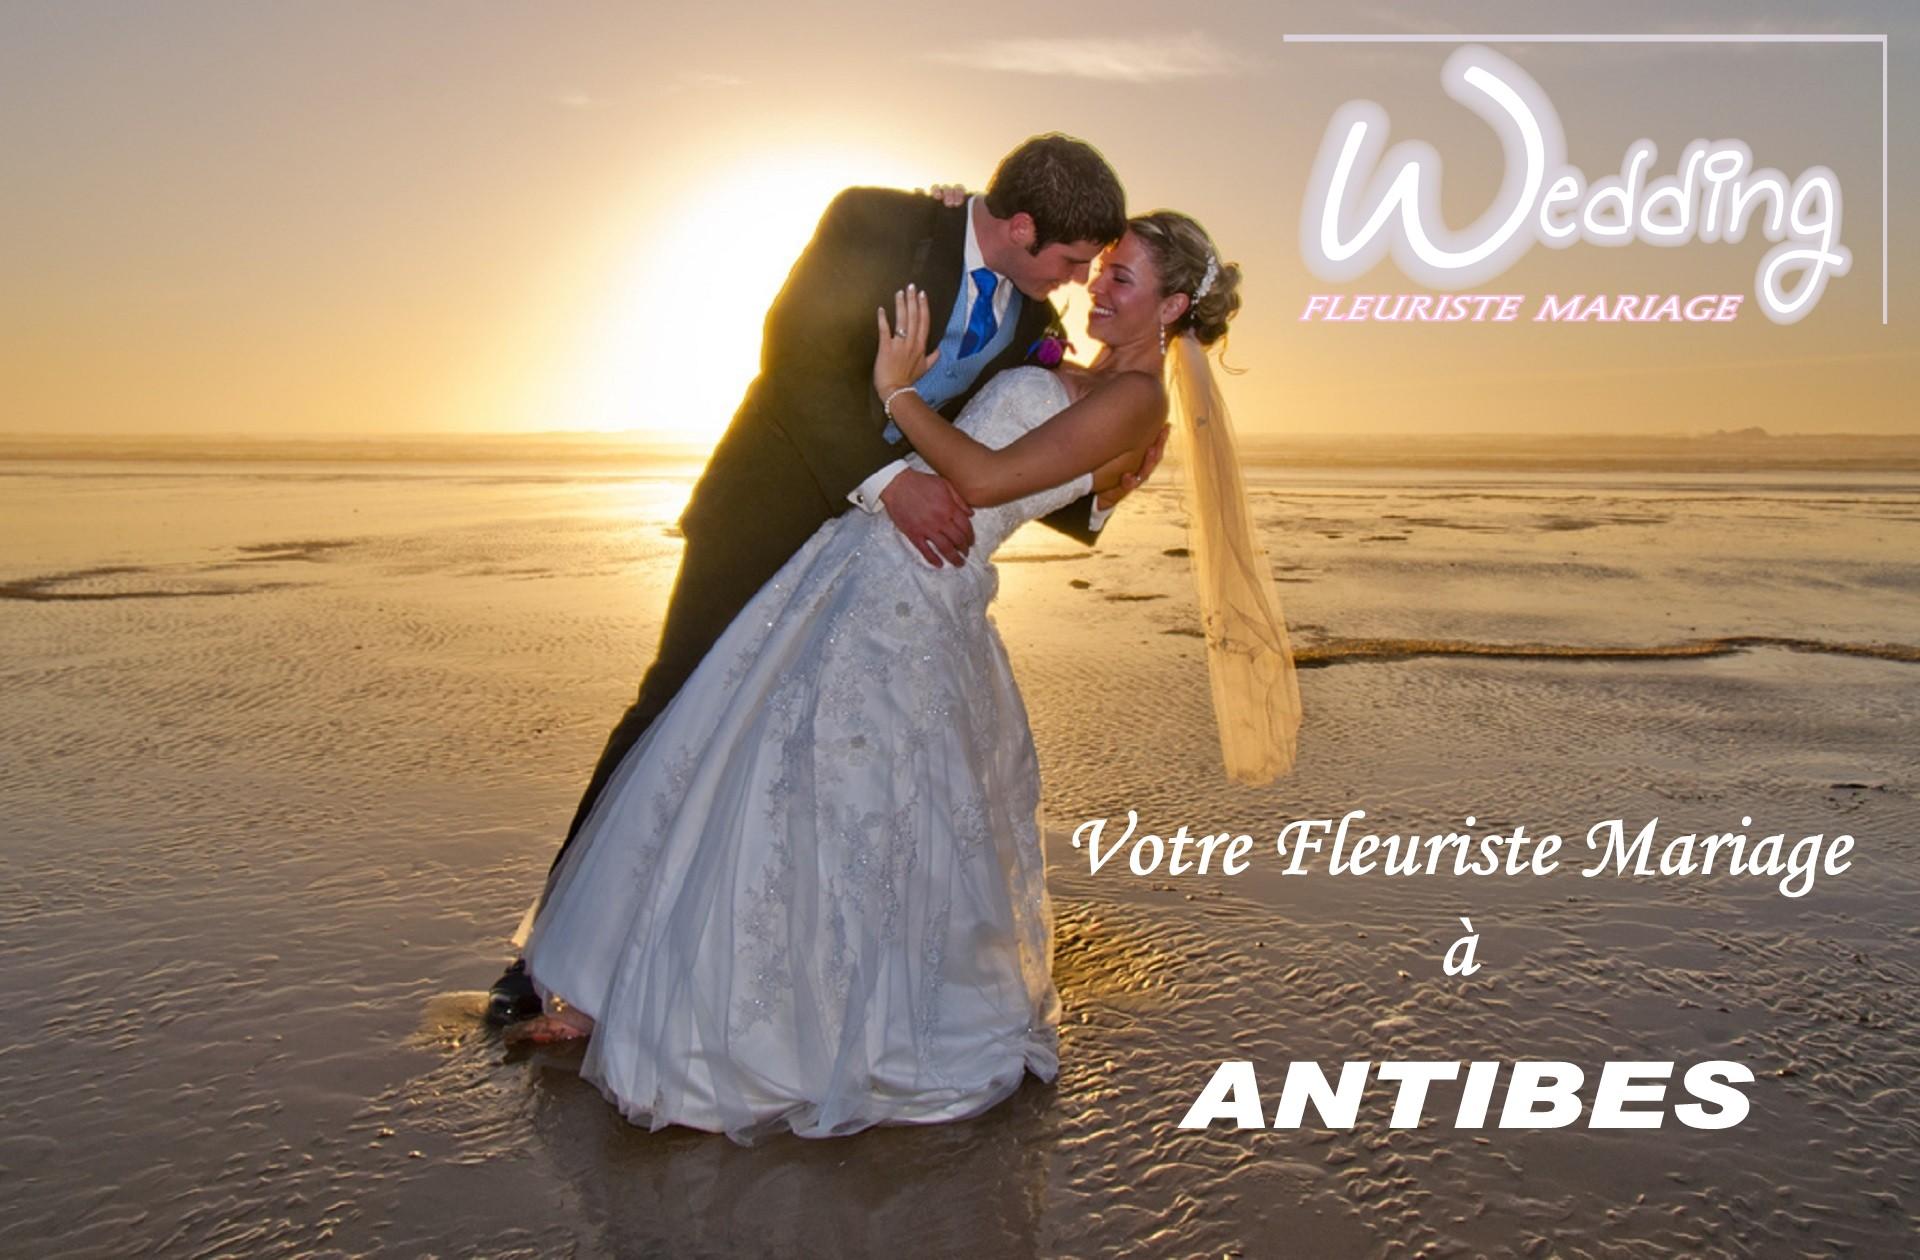 FLEURISTE MARIAGE ANTIBES - WEDDING PLANNER ANTIBES - TRAITEUR ANTIBES